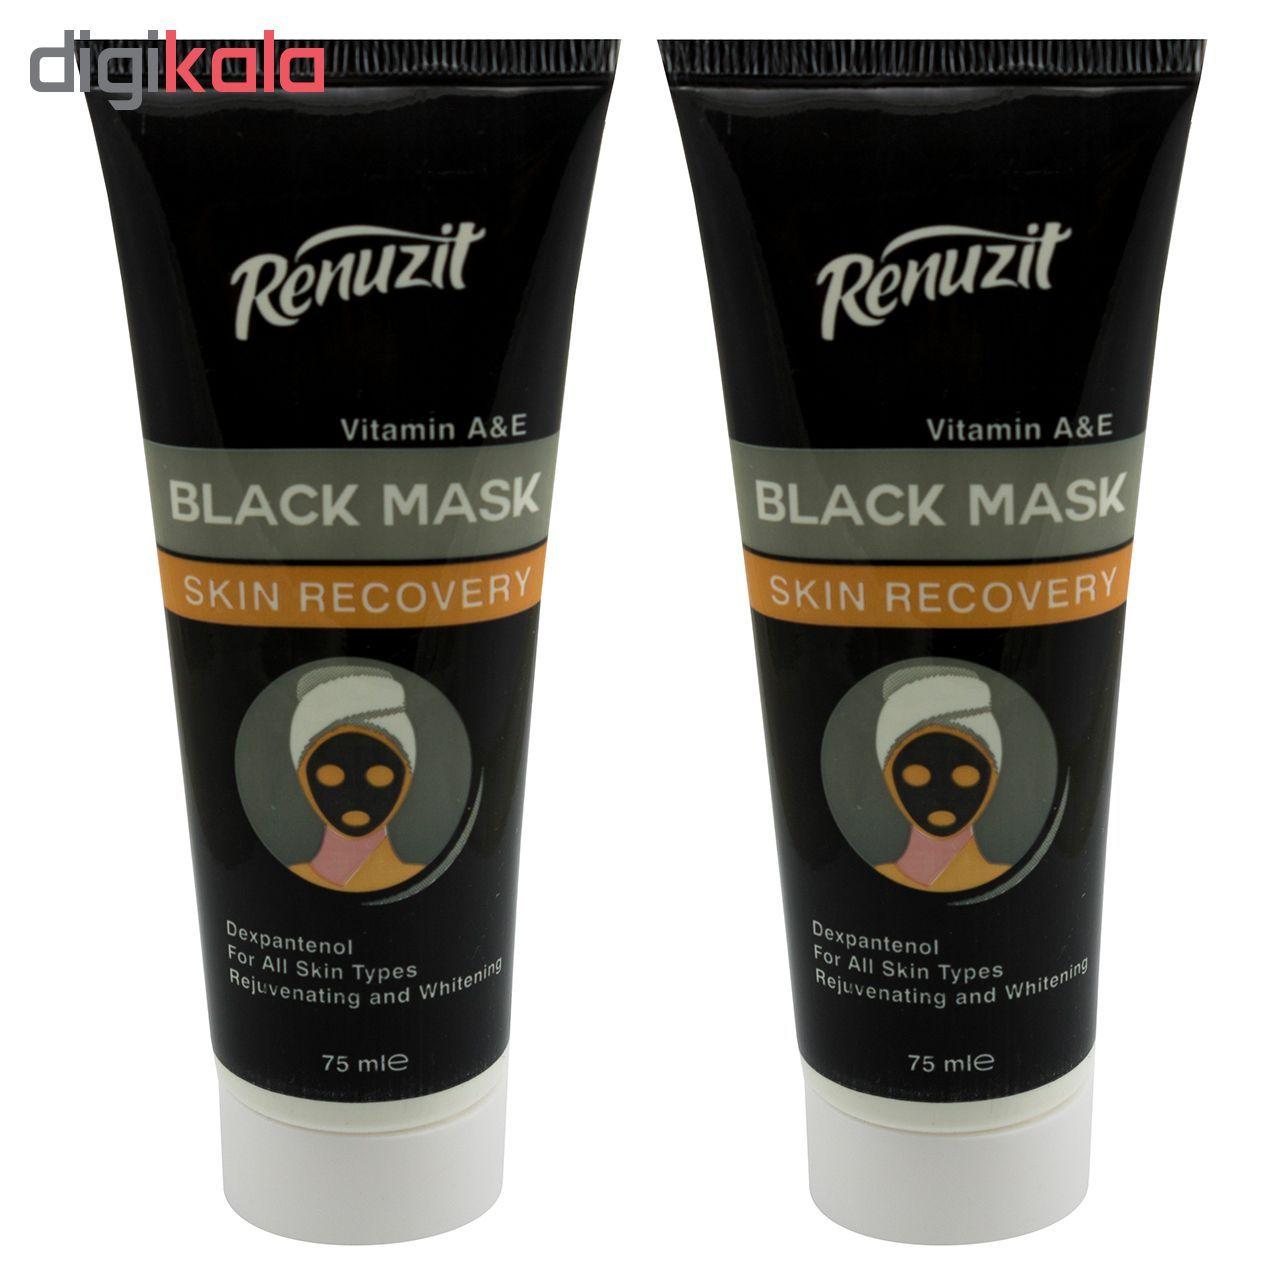 ماسک صورت رینو زیت مدل Black mask carbon active حجم 75 میلی لیتر مجموعه 2 عددی main 1 1